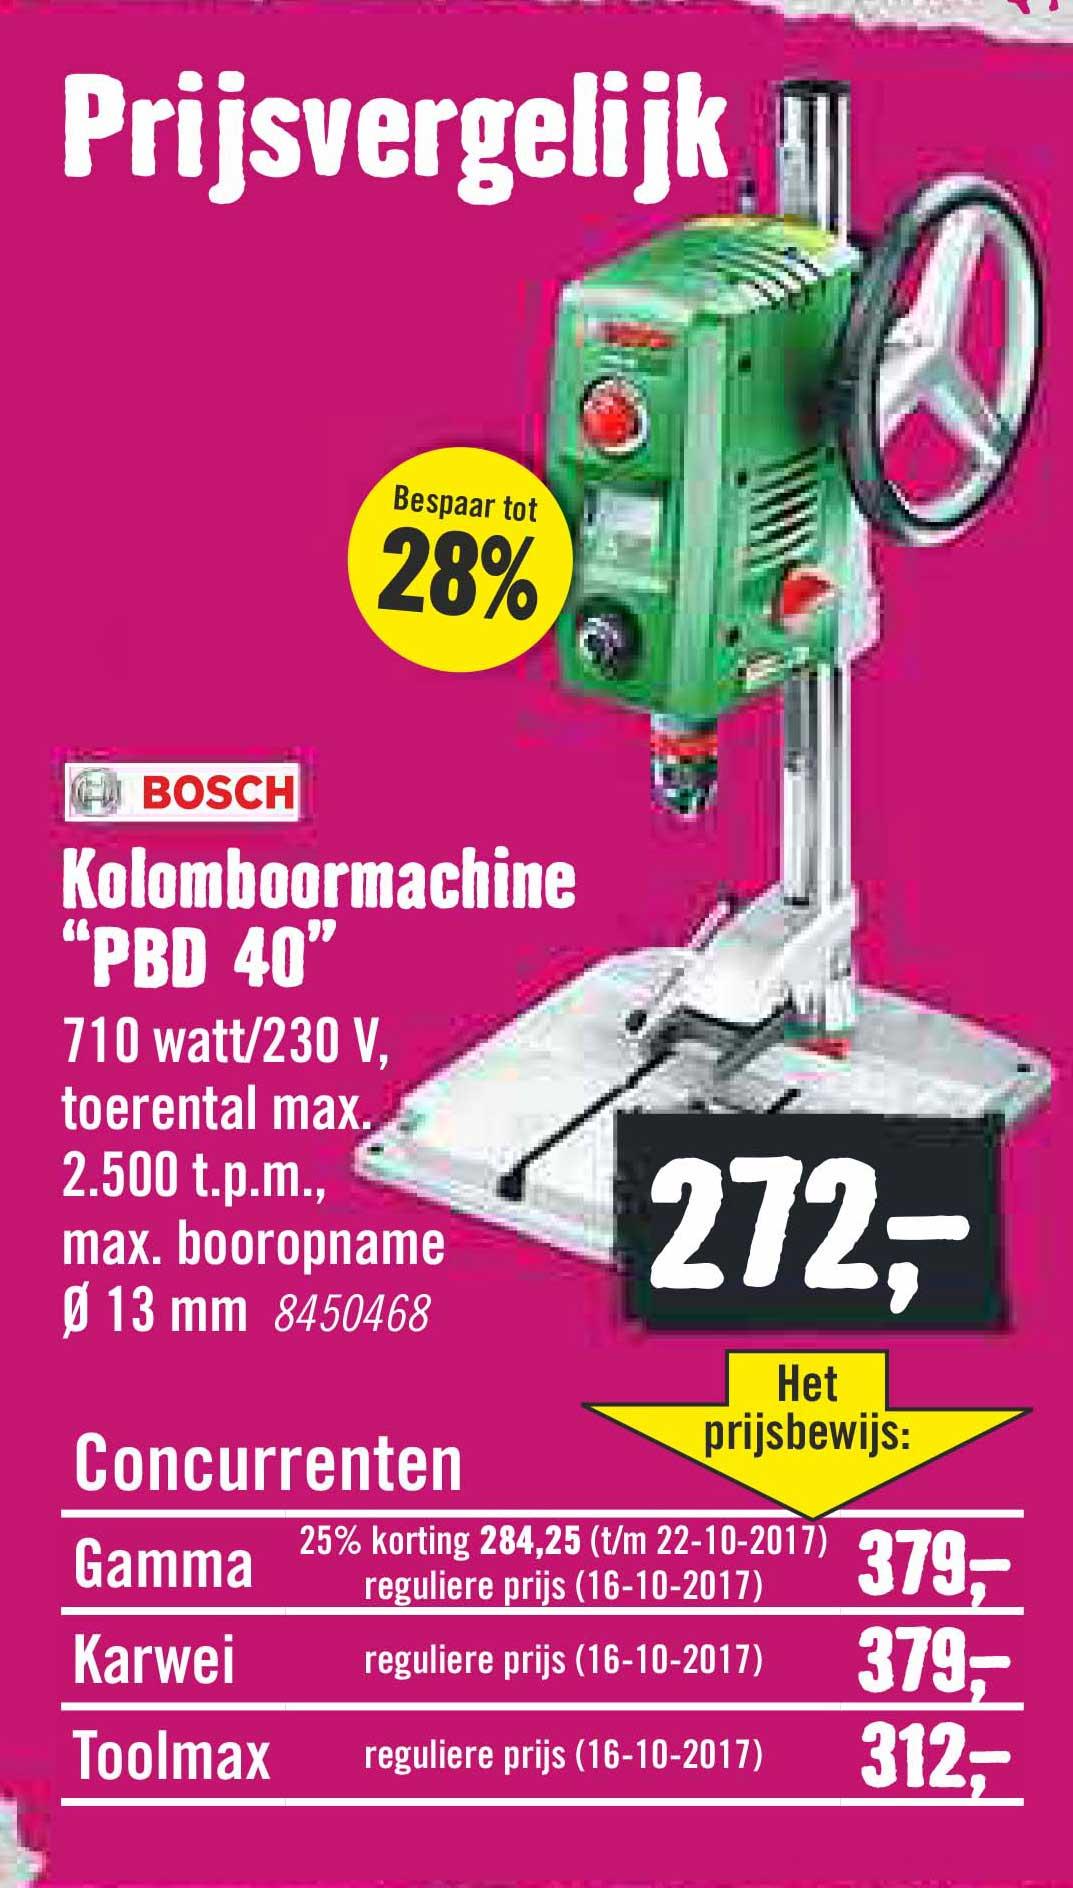 Hornbach Bosch Kolomboormachine PBD 40